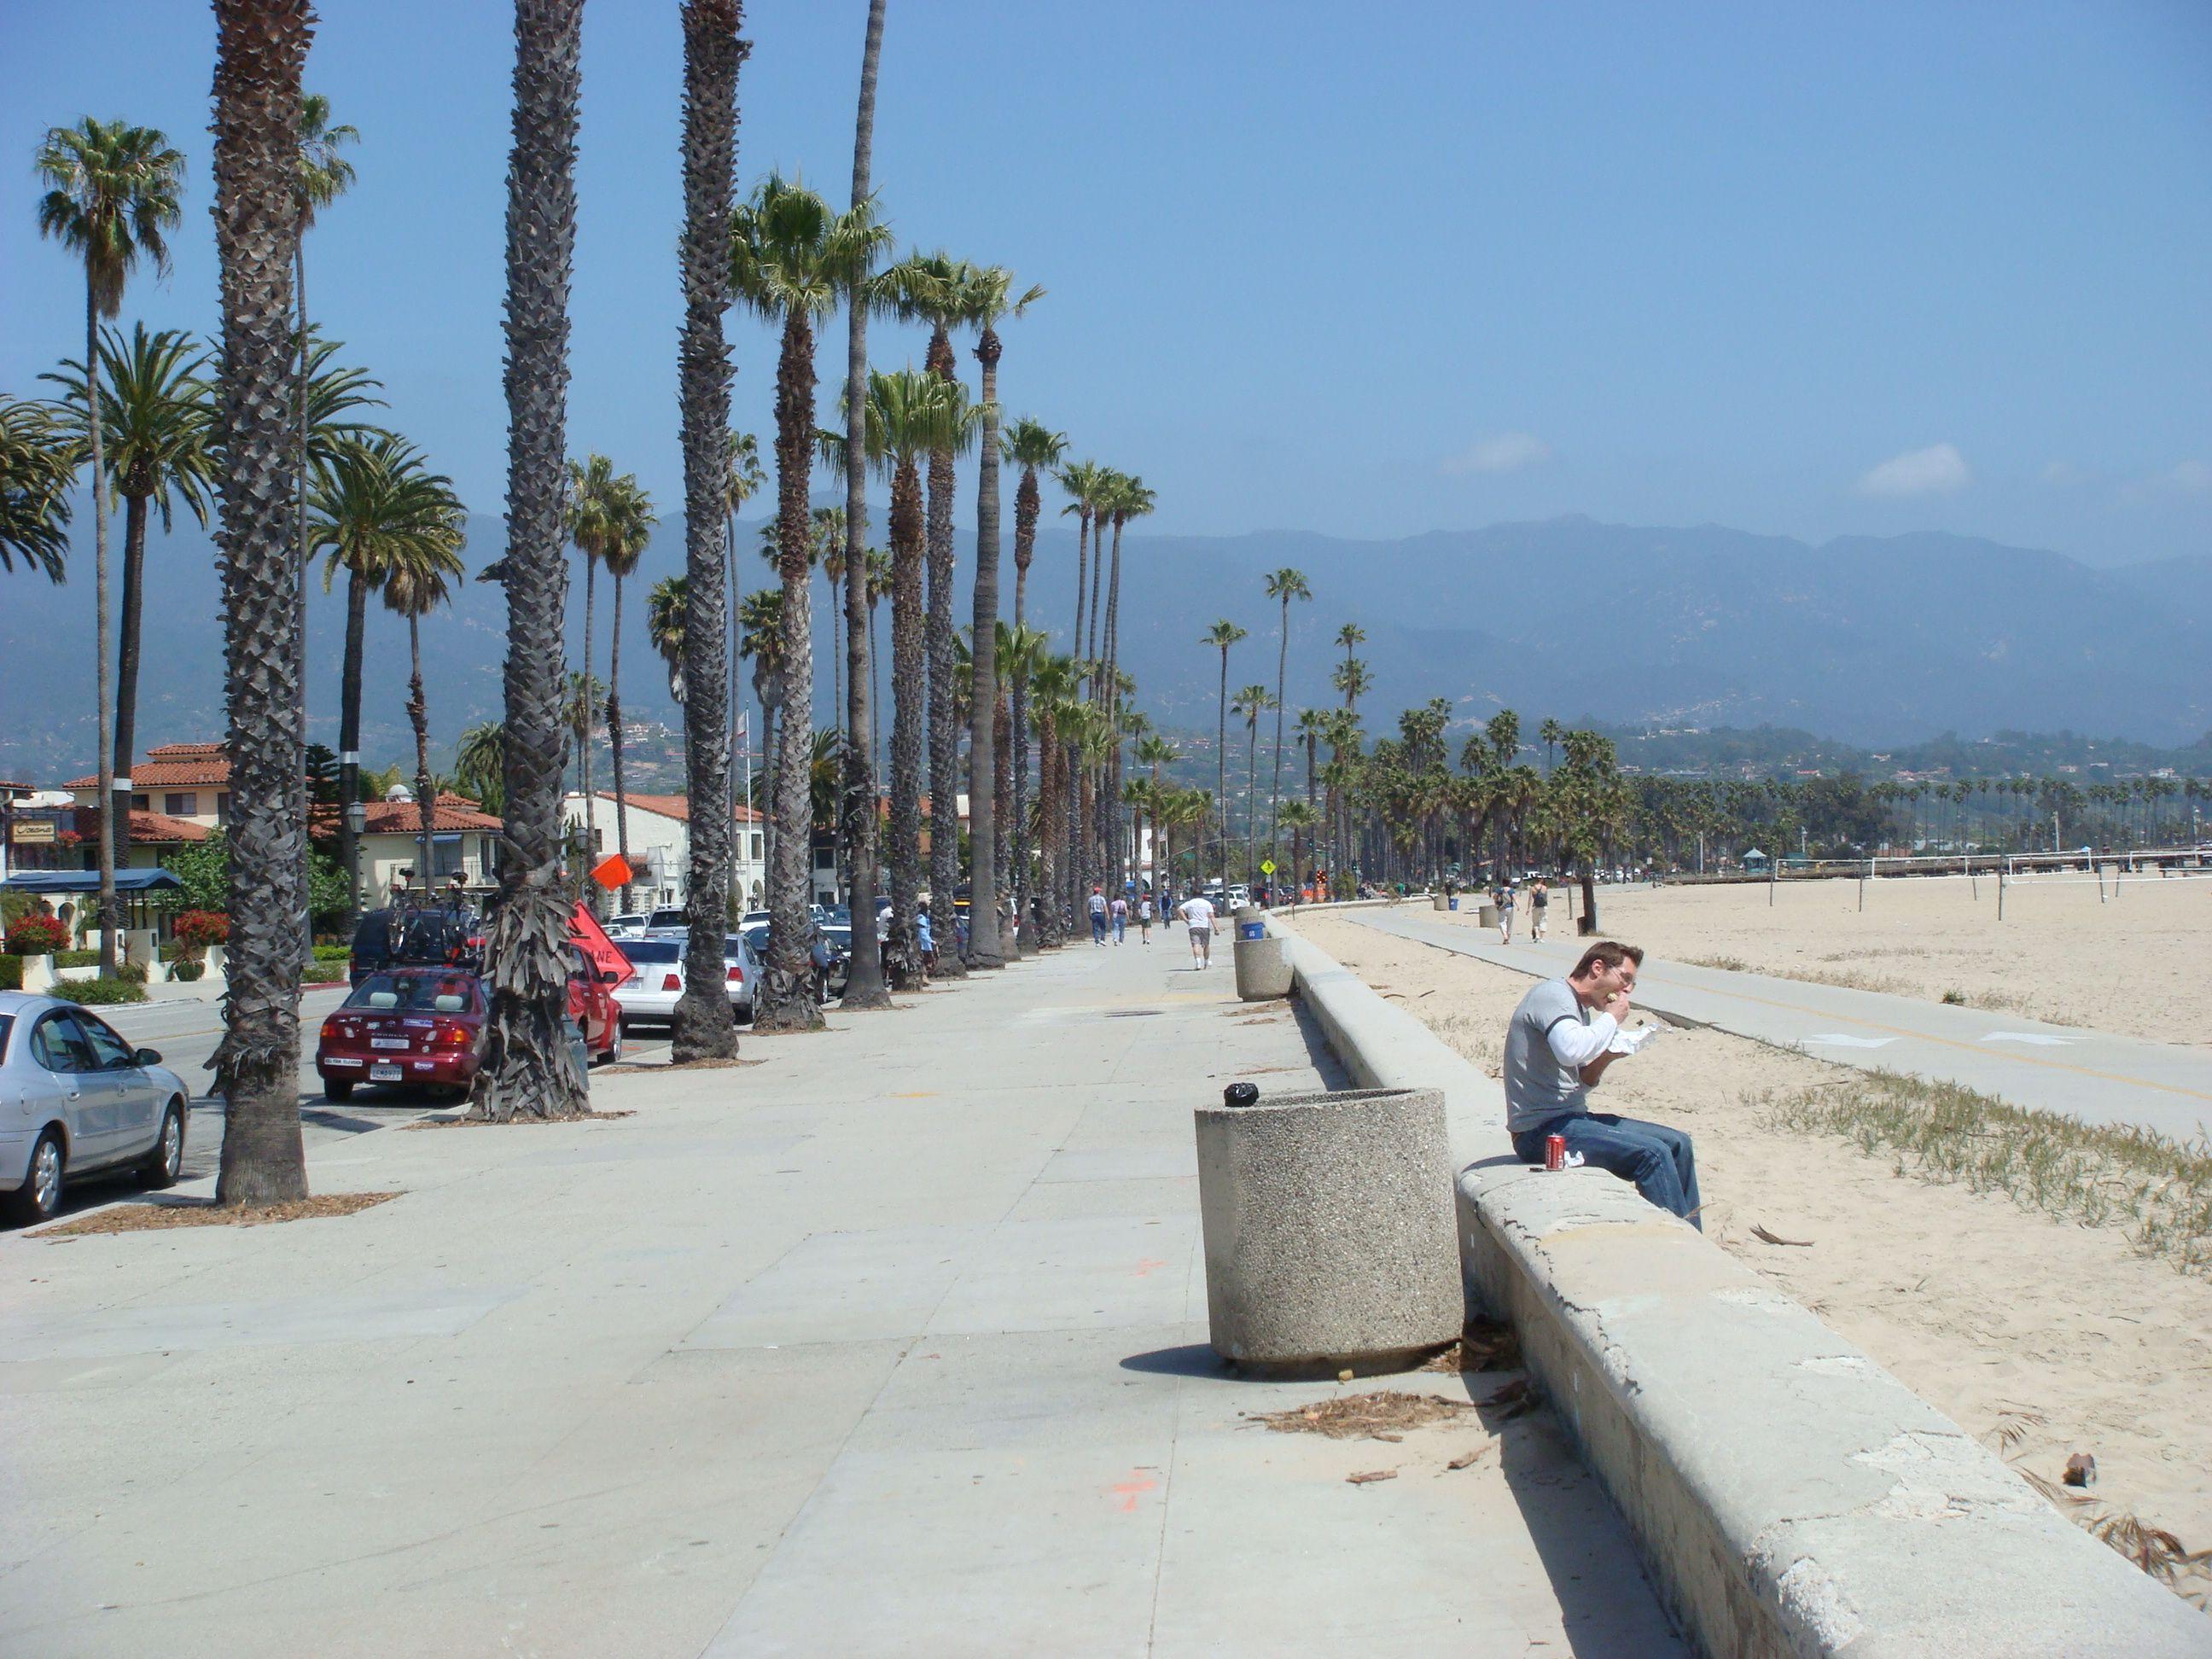 Http Www Firsttimecentralcoast Images Santa Barbara Bay Beach Boardwalk Jpg